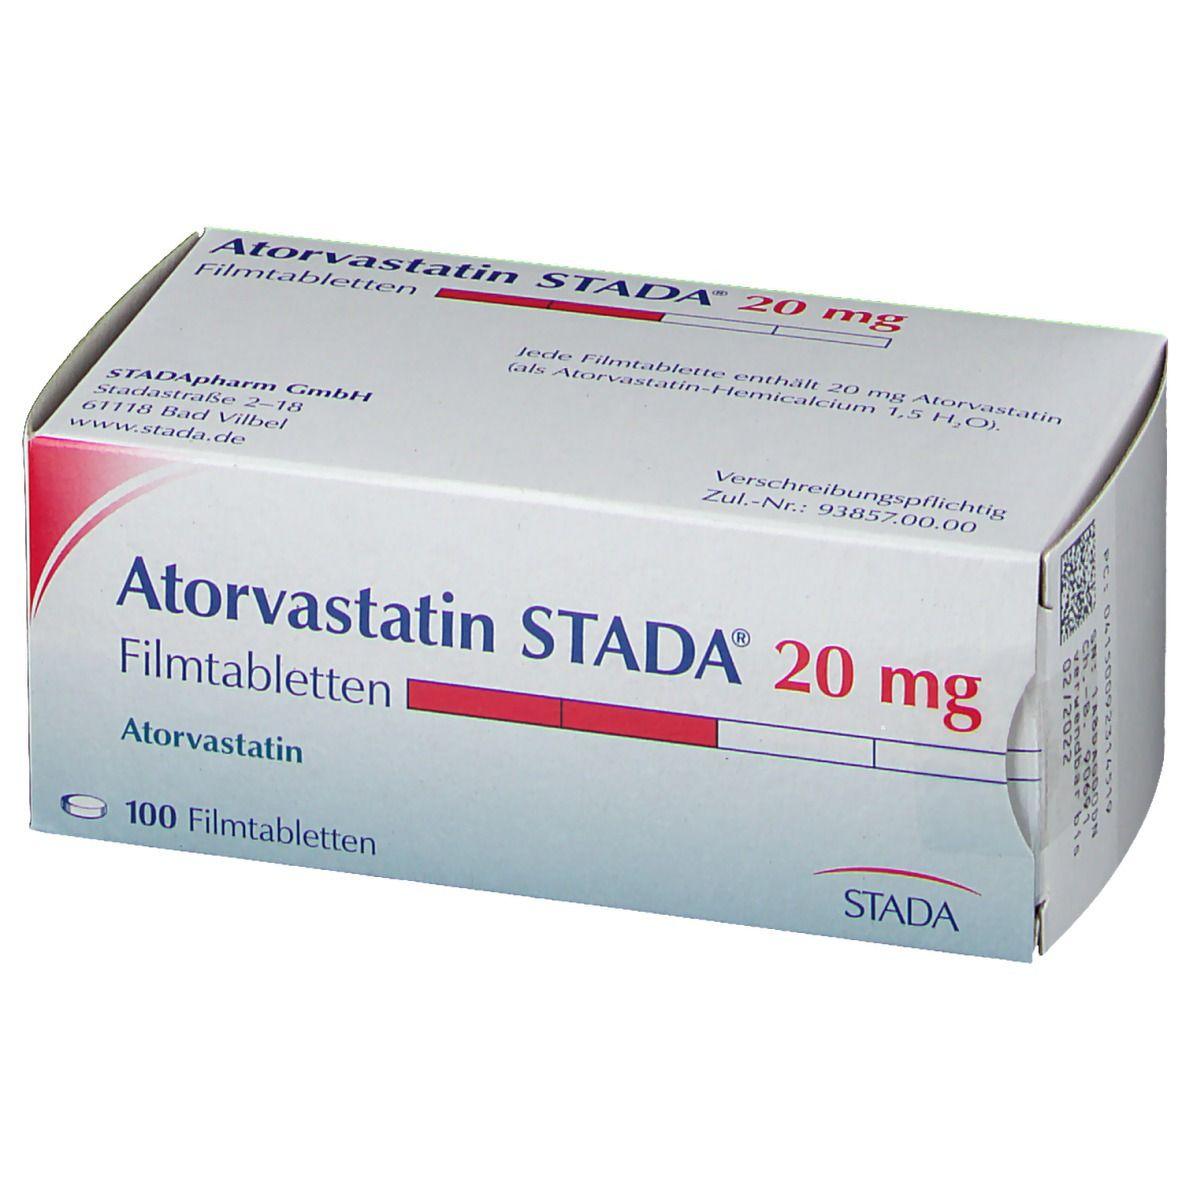 Atorvastatin STADA® 20 mg